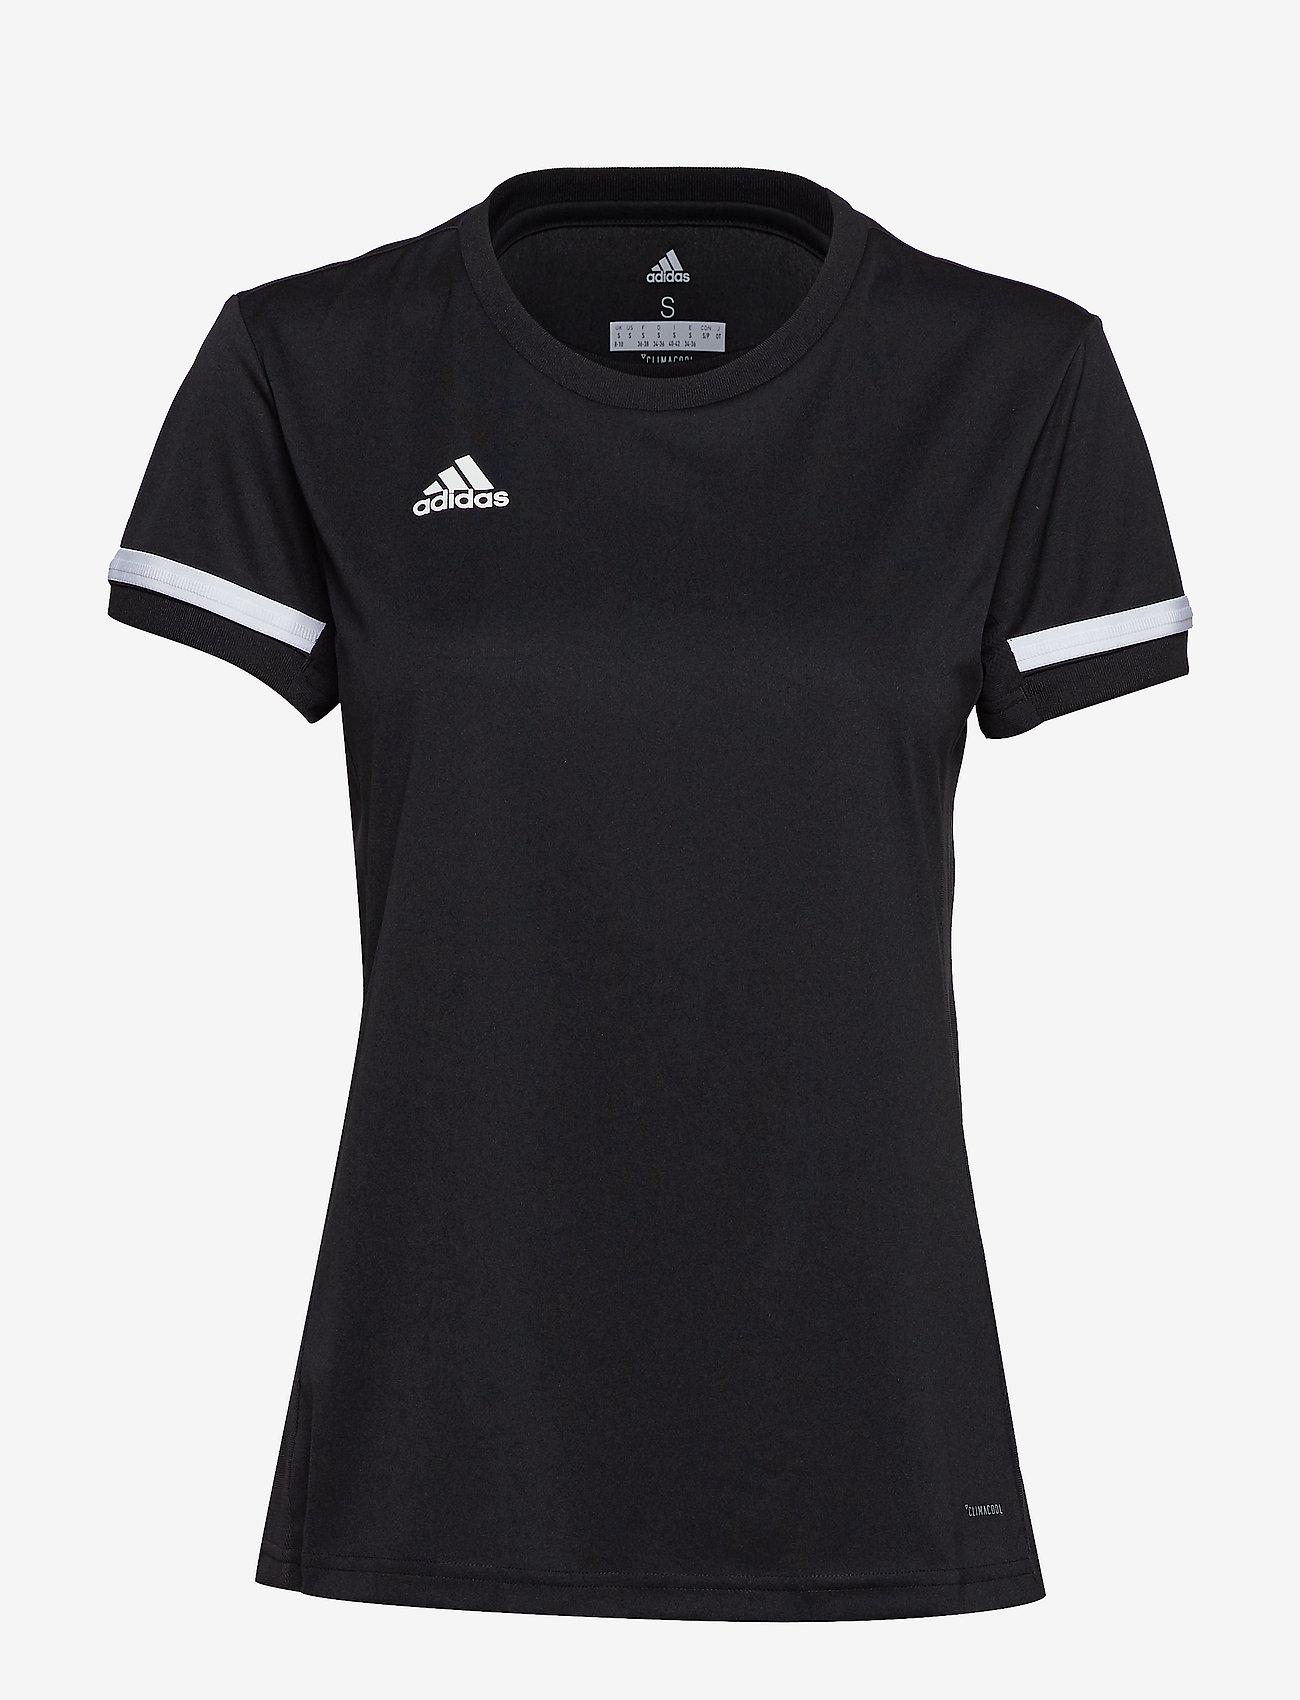 adidas Performance - Team 19 Jersey W - football shirts - black - 1